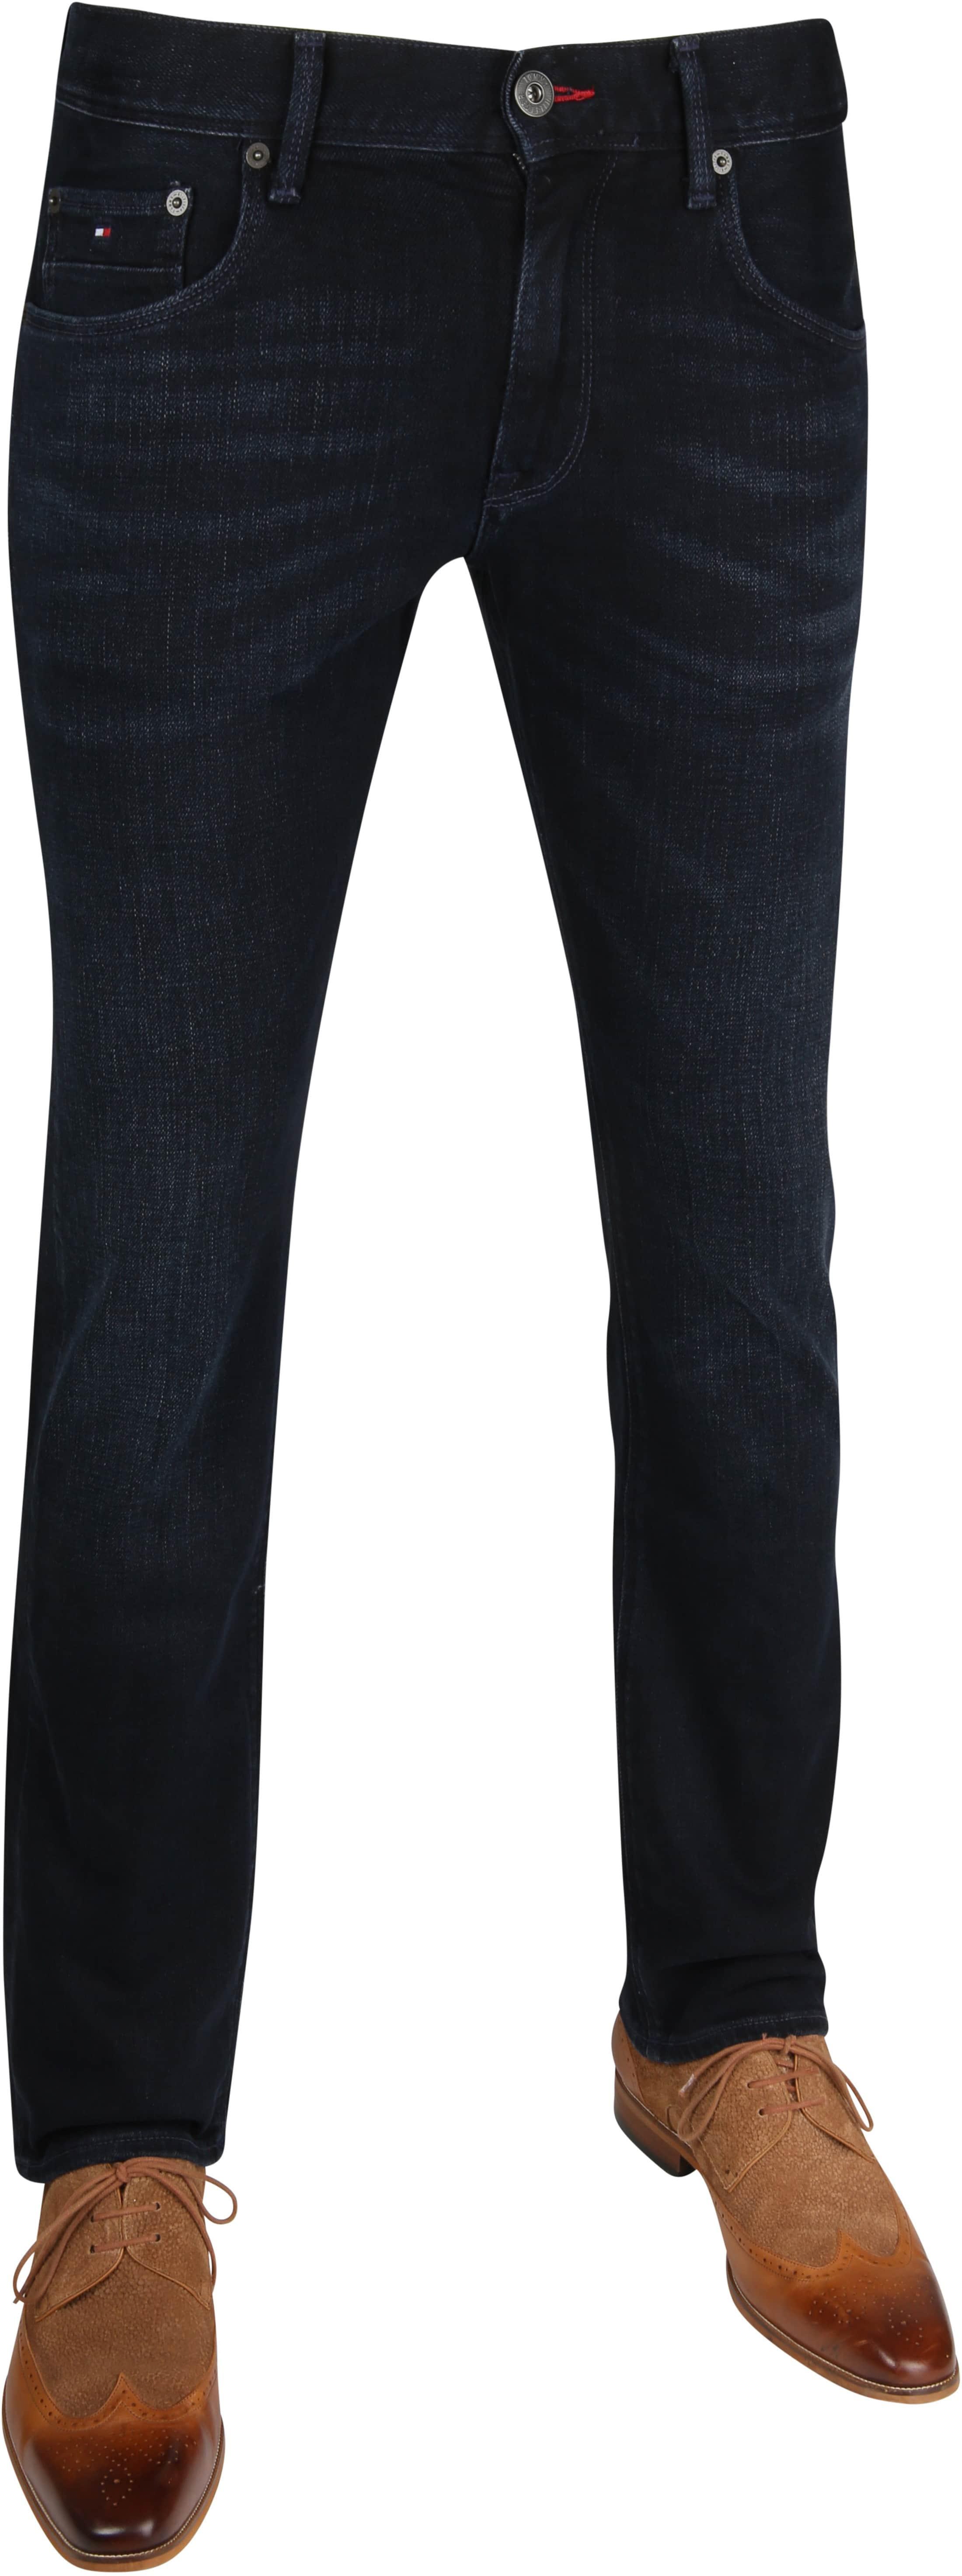 b93fd276dc884 Tommy Hilfiger Core Denton Jeans Navy MW0MW01759-919 order online ...